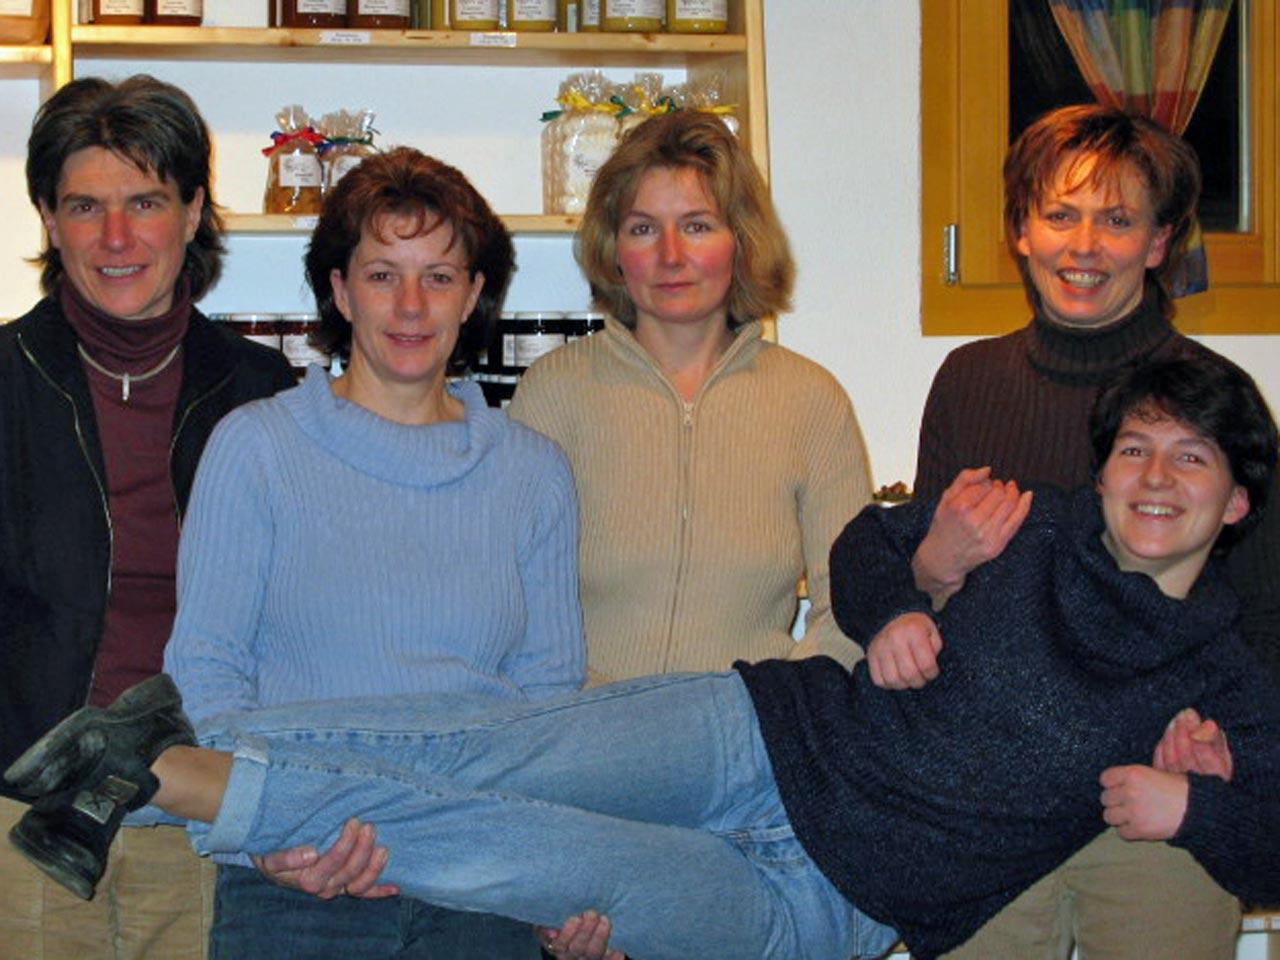 2004 – Vorstand, von links: Judith Stadler, Lisbeth Arnold, Monika Villiger, Regine Villiger, Veronika Sidler.